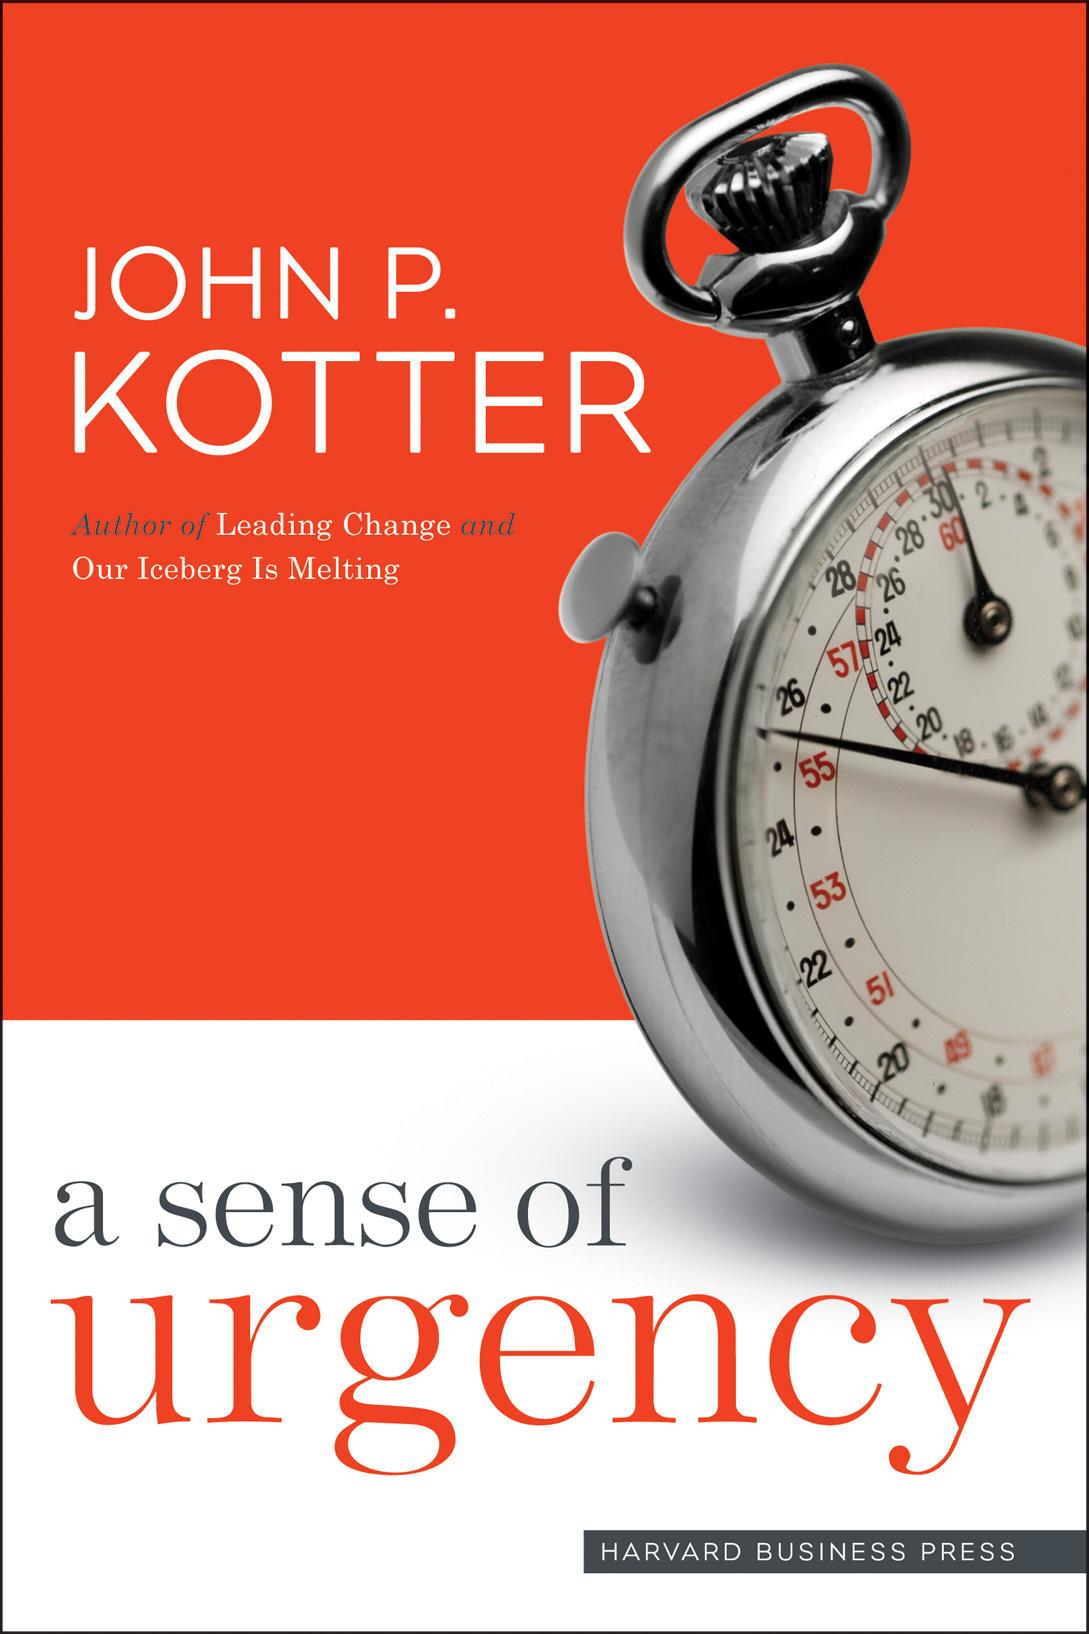 Kotter Sense of Urgency